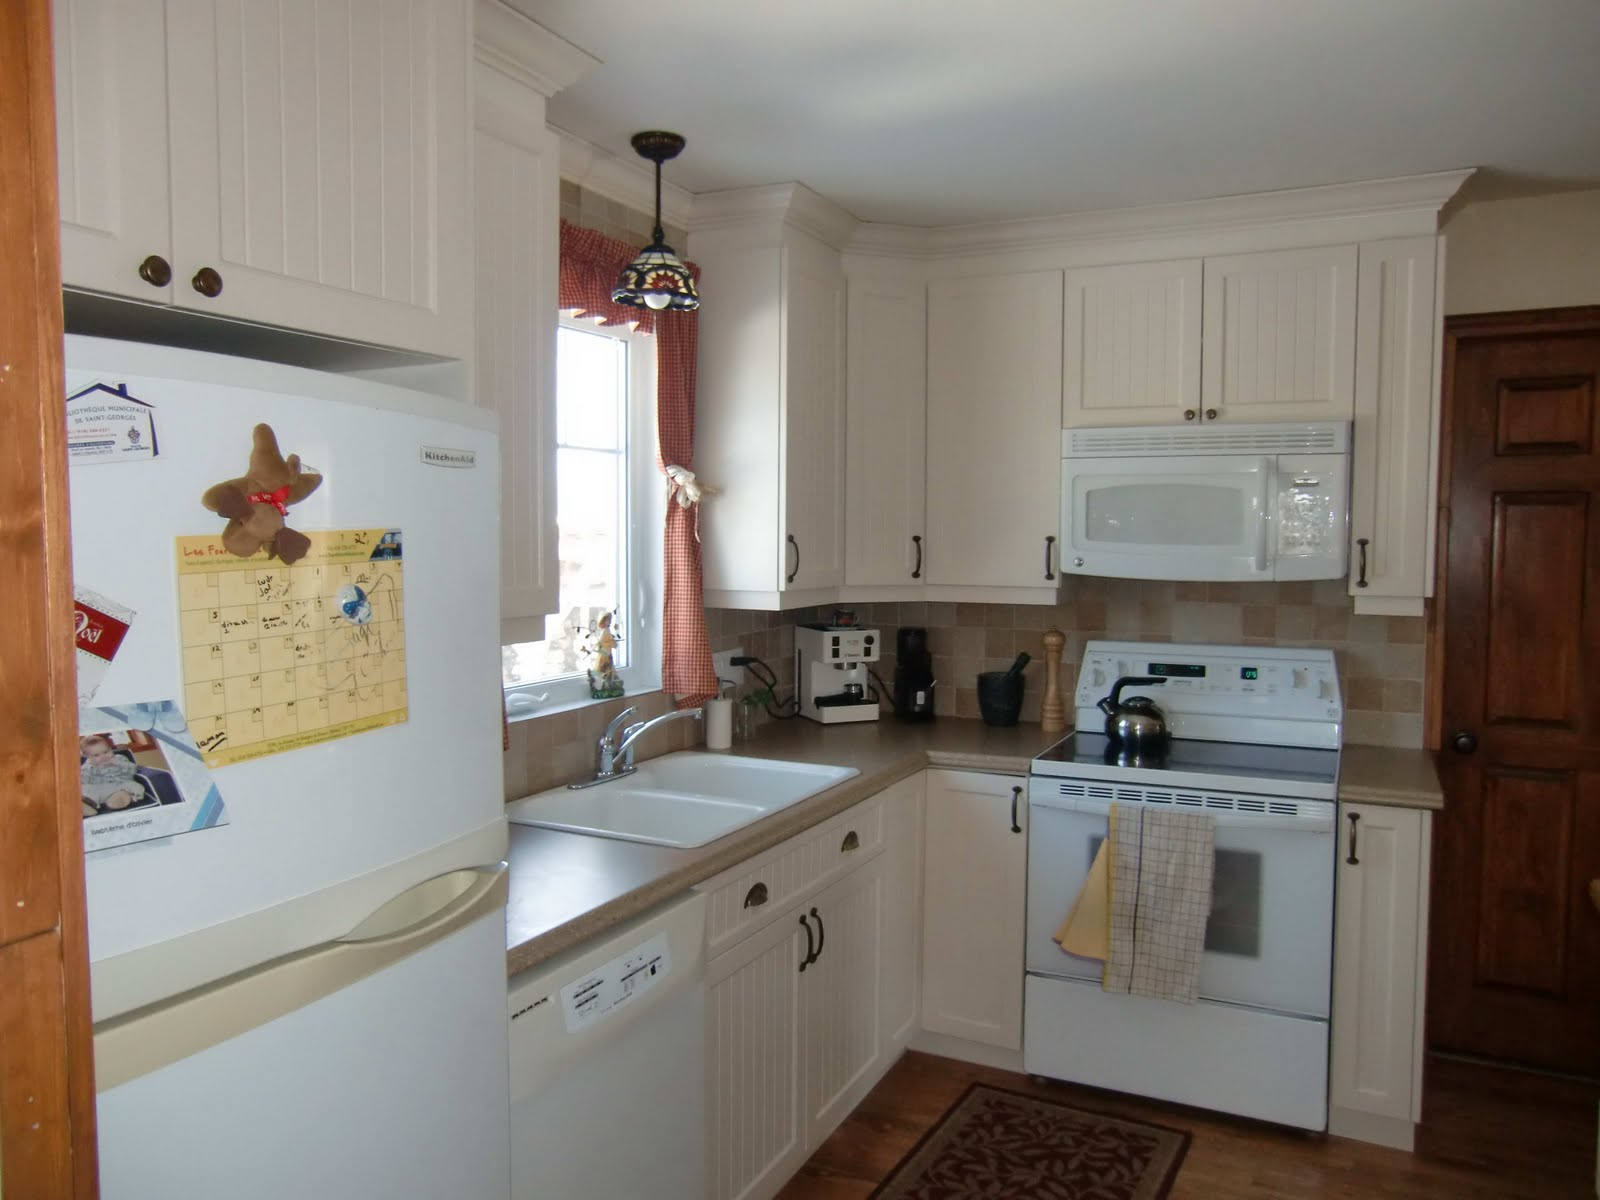 Specialit smm armoire de cuisine en thermoplastique for Cuisine en stratifie